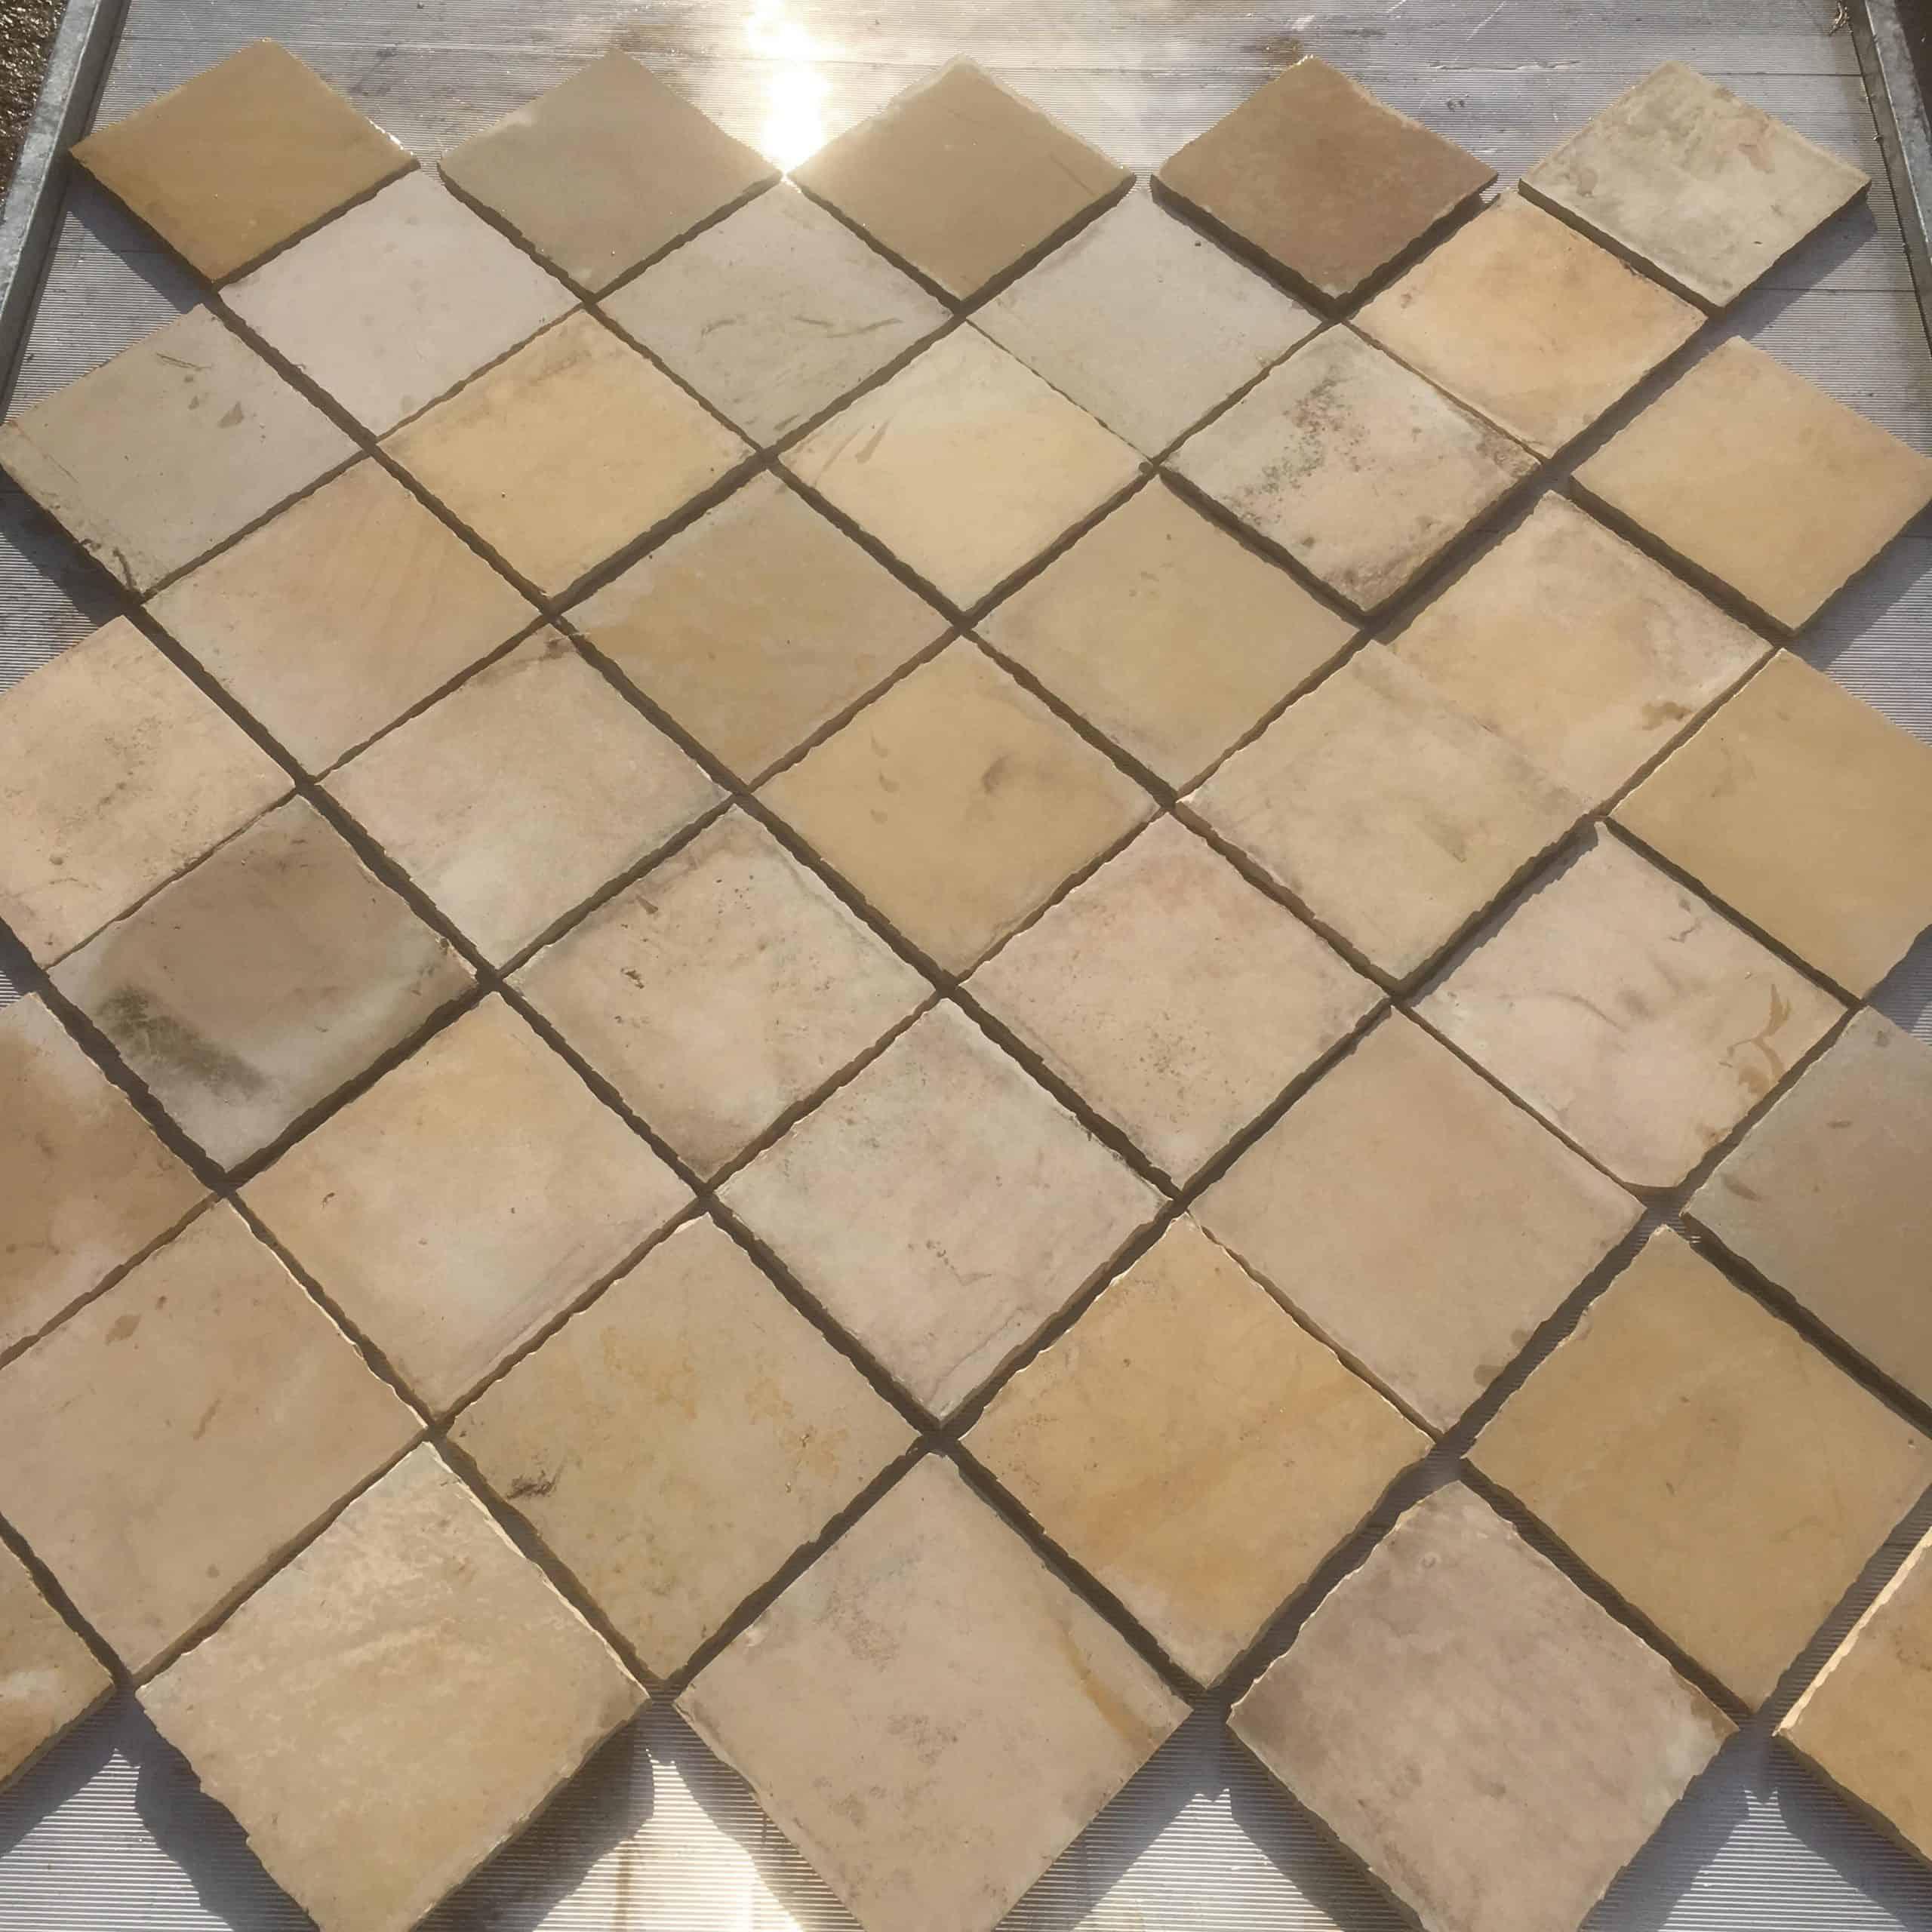 Original historische Handgekantete quadratische Sollnhofer Platten